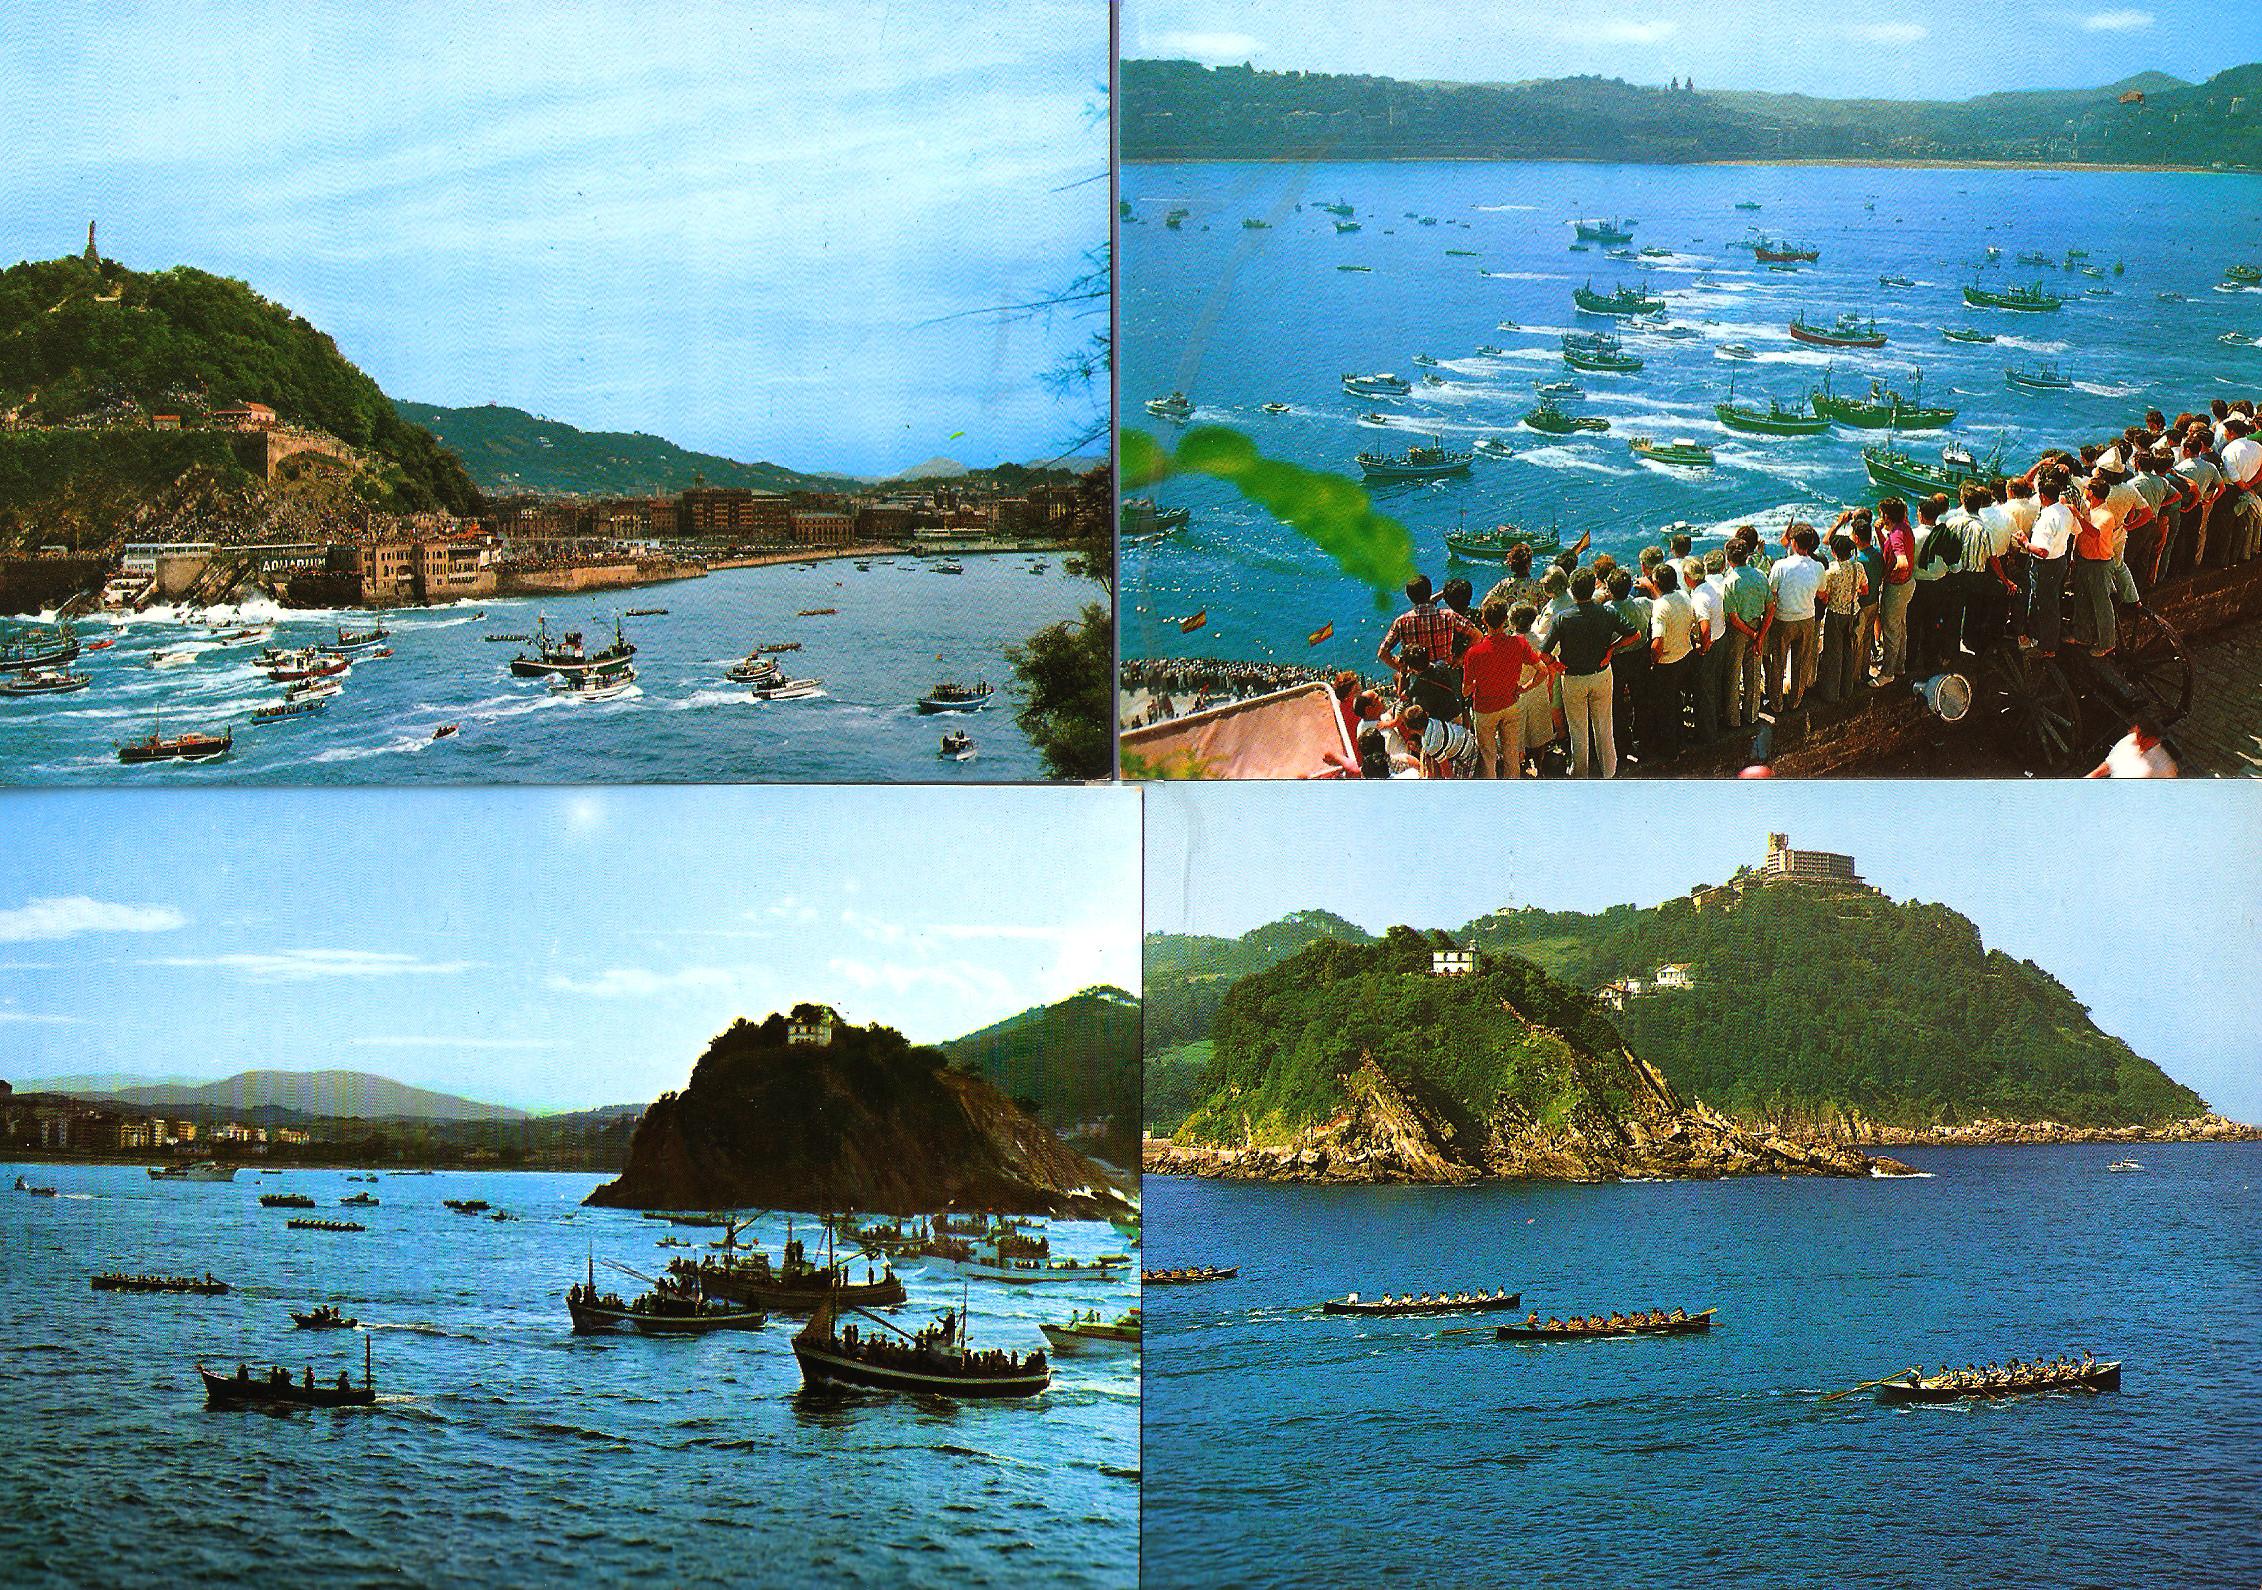 TEMATICA - Puertos pesqueros de España a través de las postales 44212213222_87ba090357_o